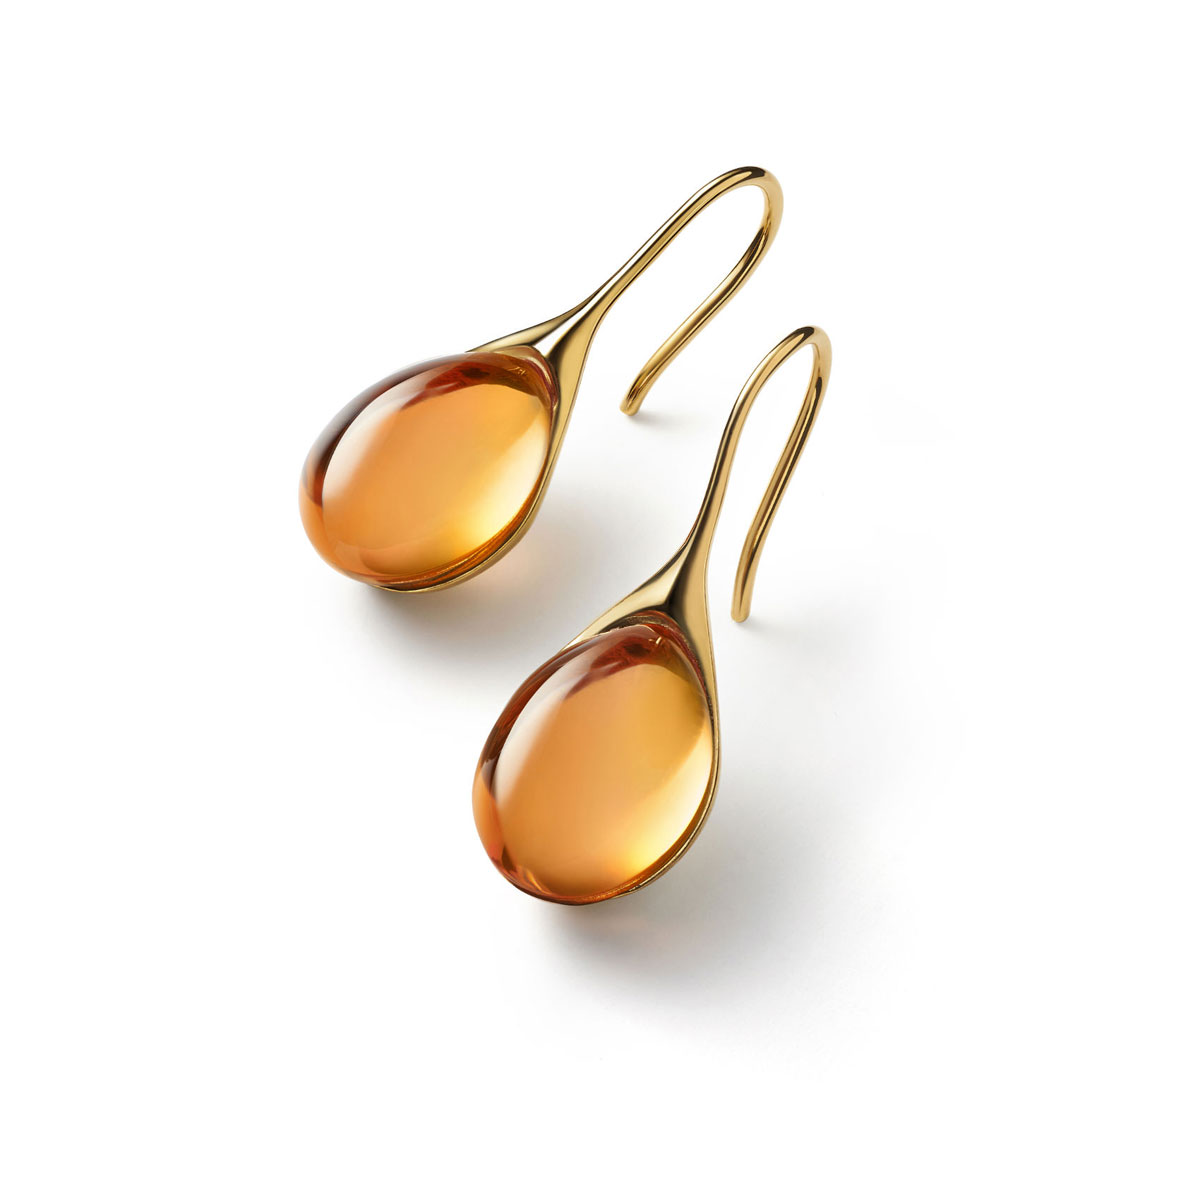 Baccarat Crystal Galea Wire Earrings Vermeil Gold Honey